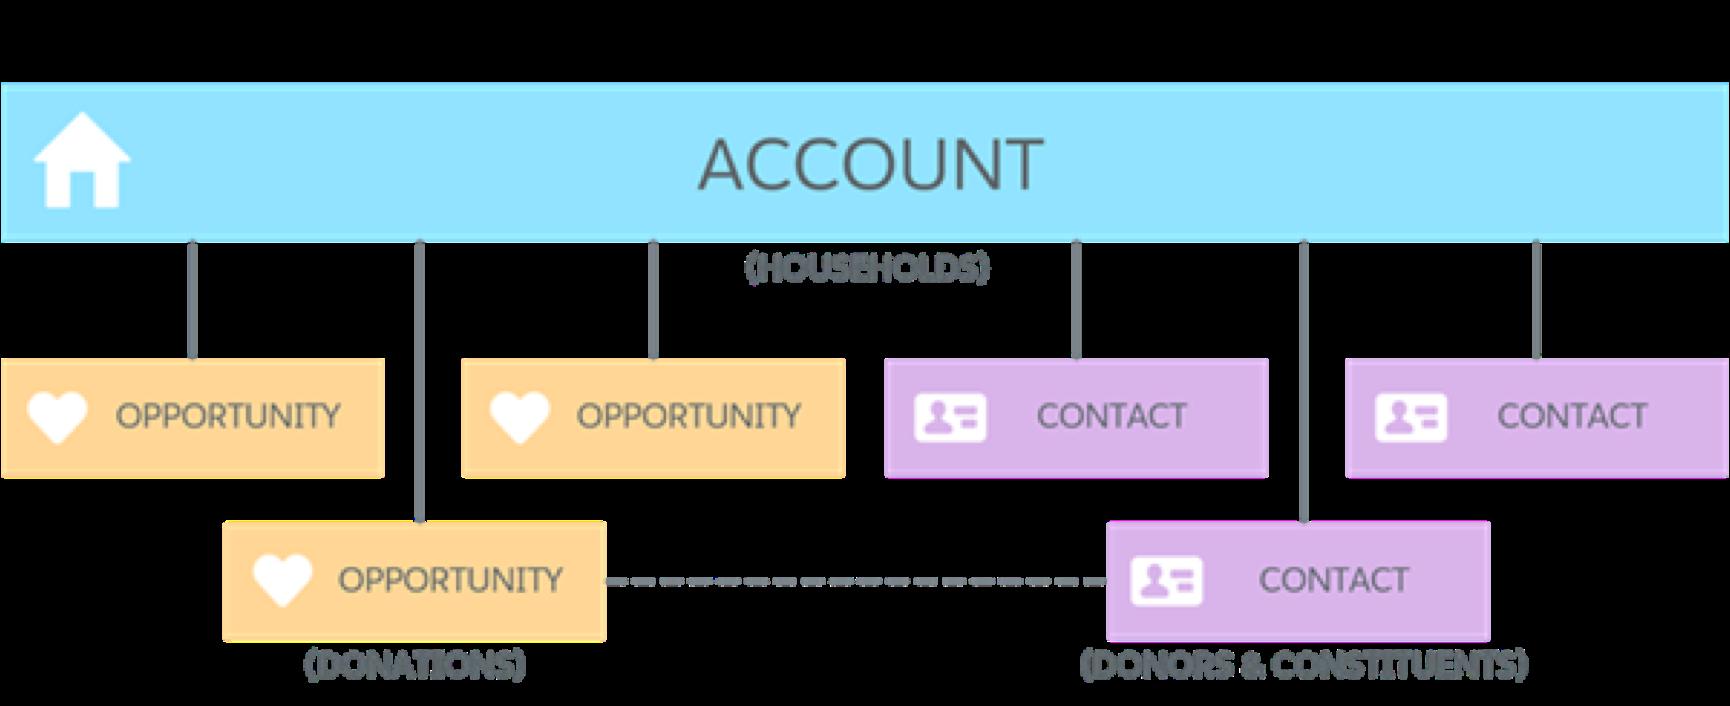 Household account model